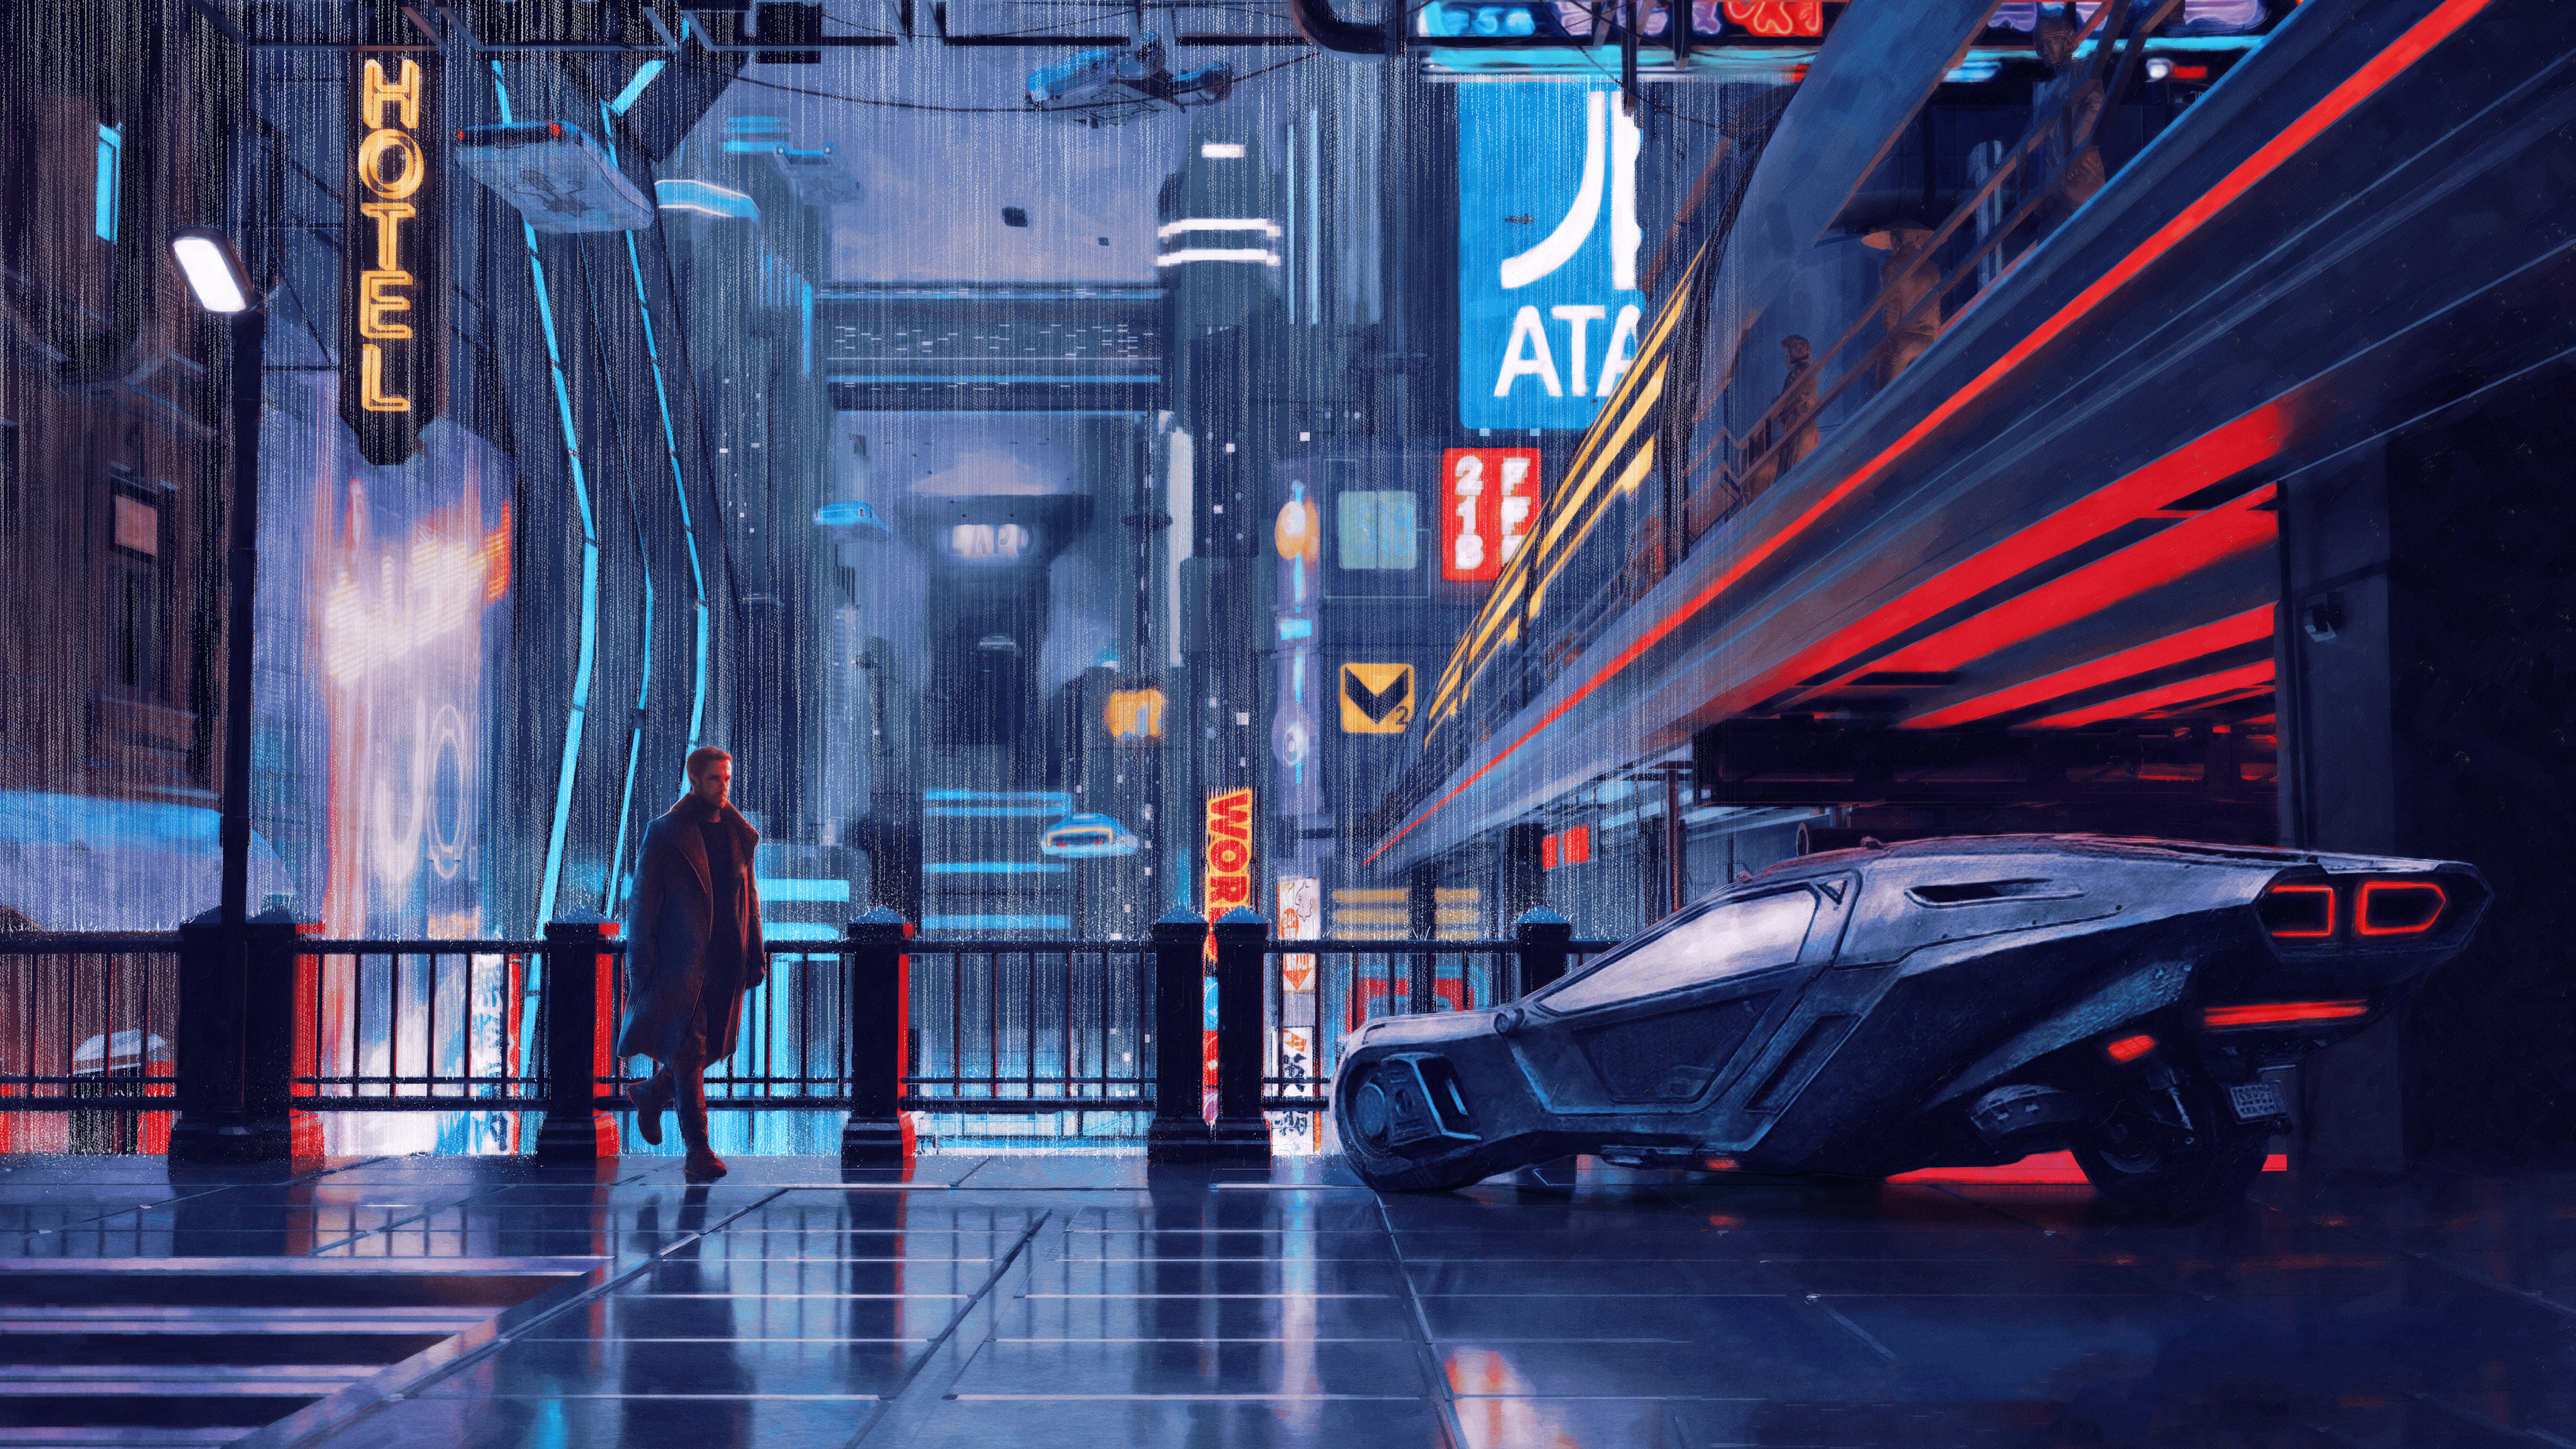 Blade Runner 2049 Arts ryan gosling wallpapers, movies ...